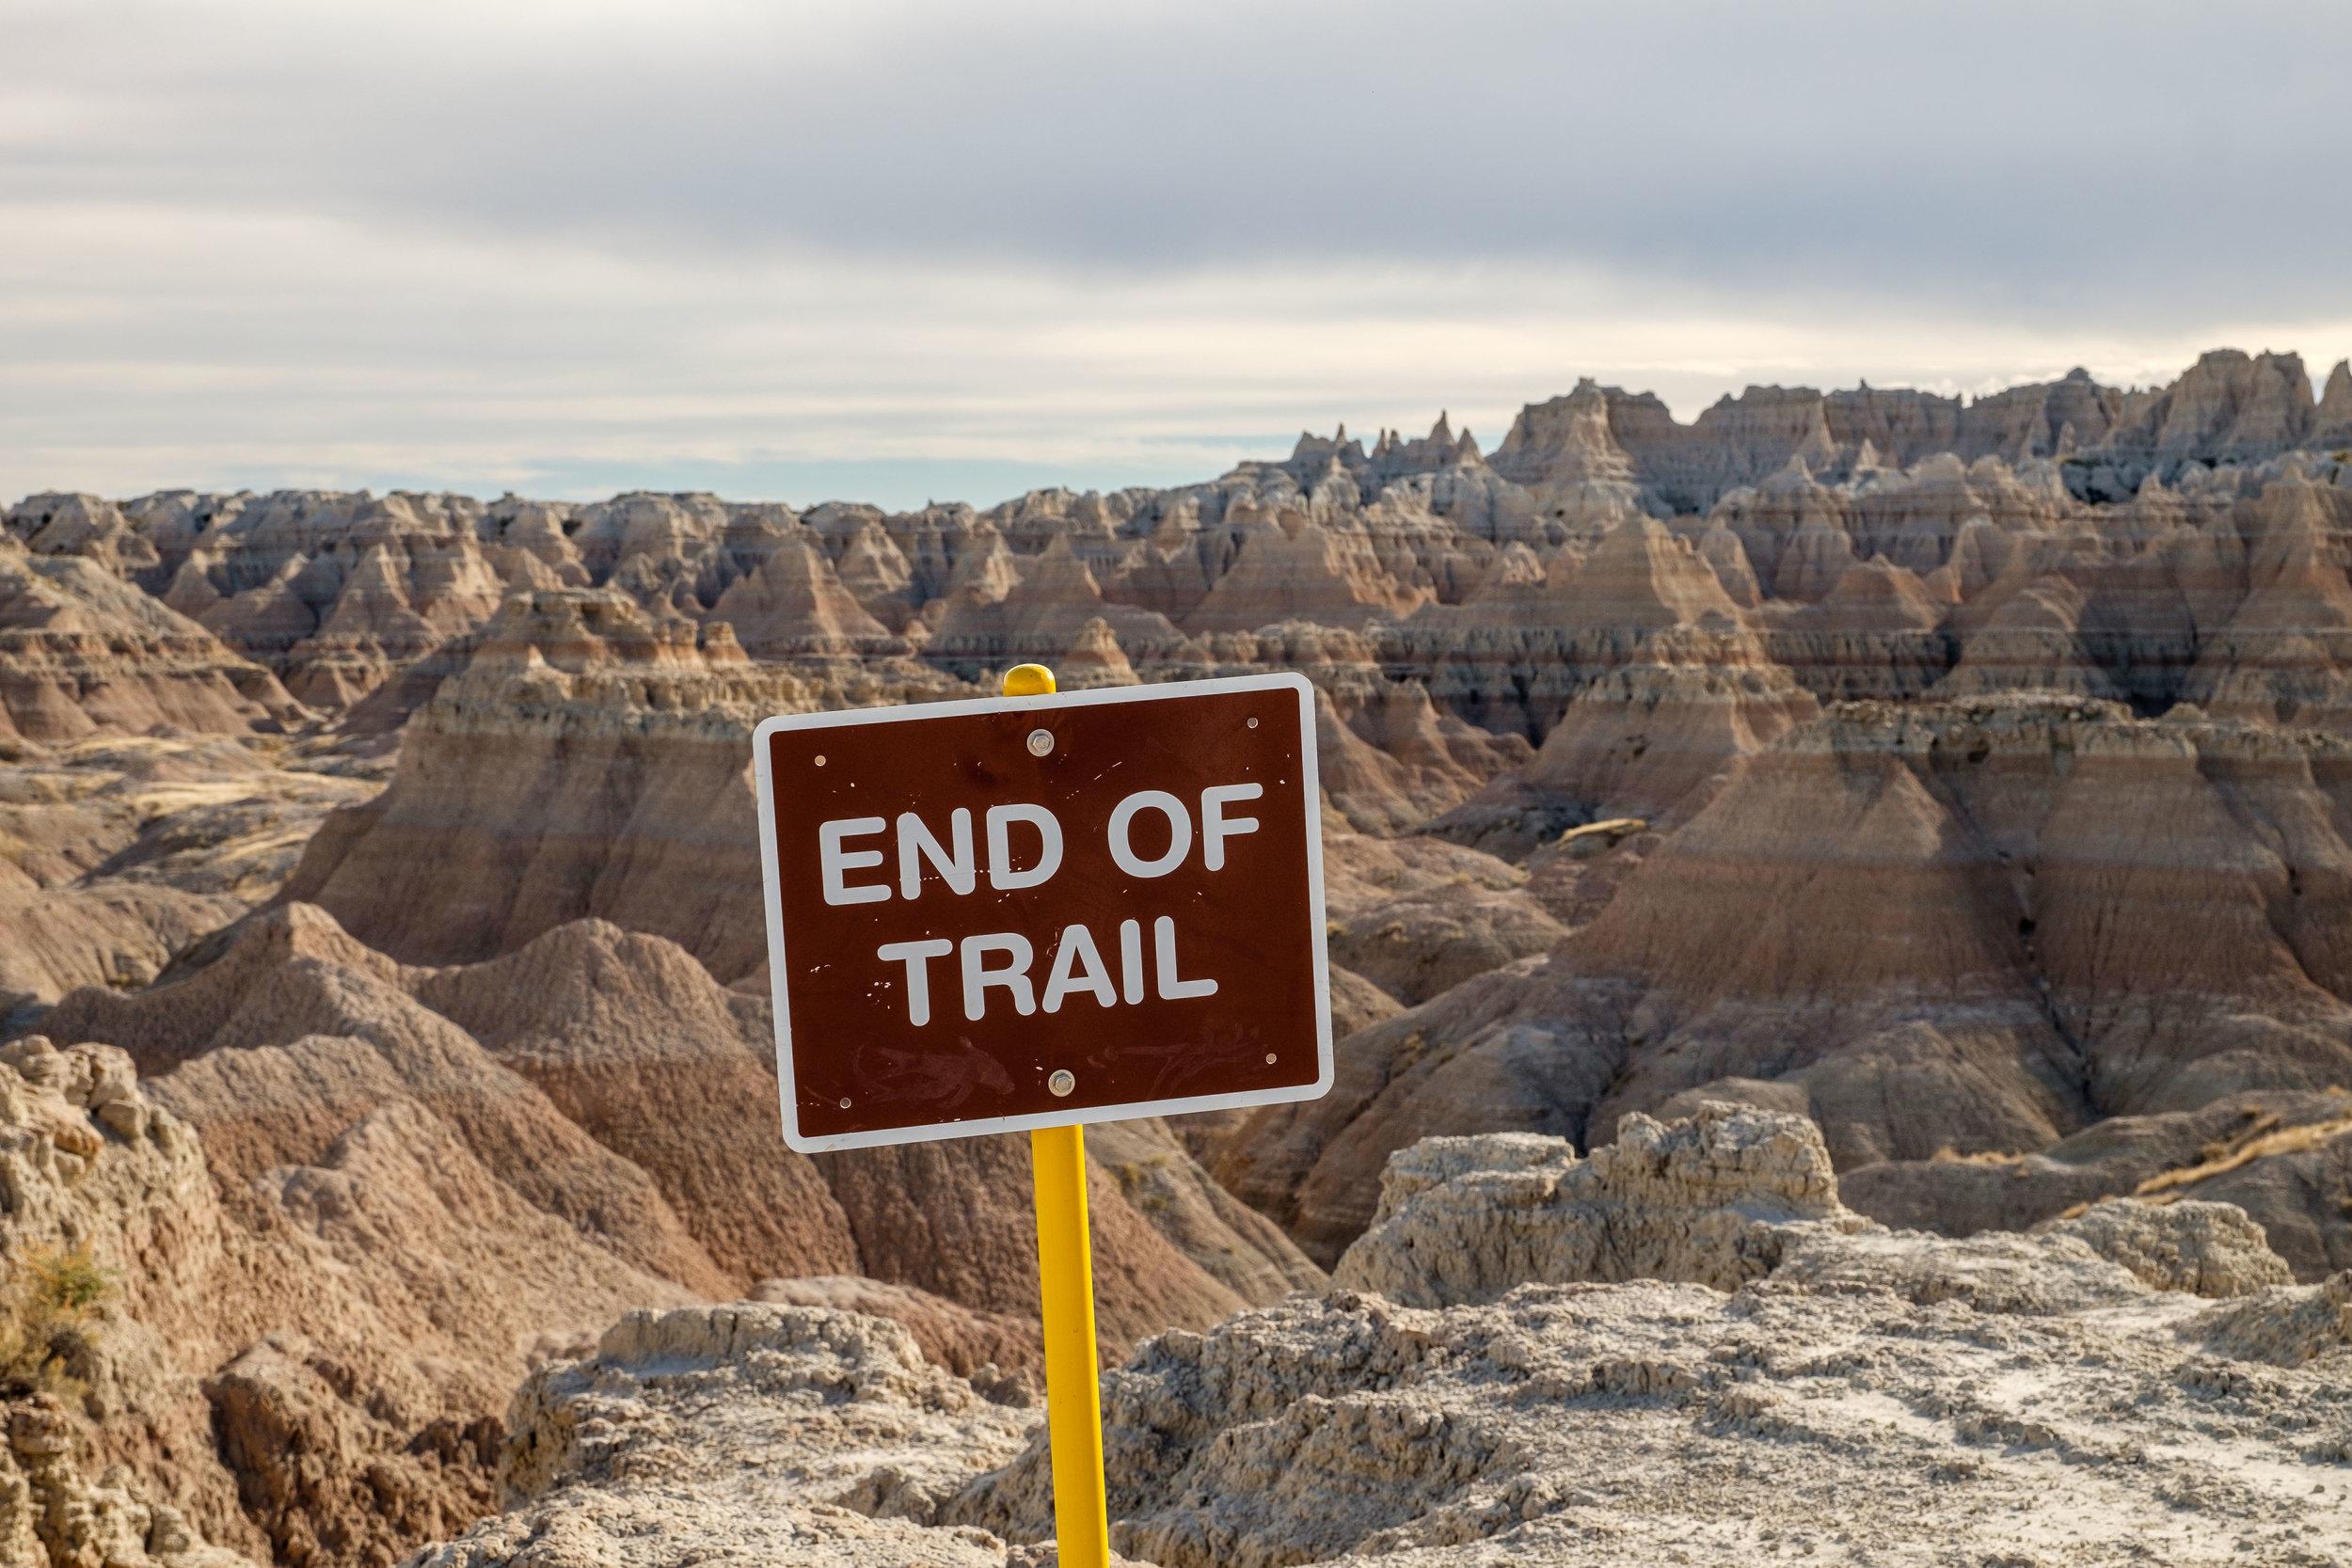 End of trail in Badlands National Park in South Dakota.